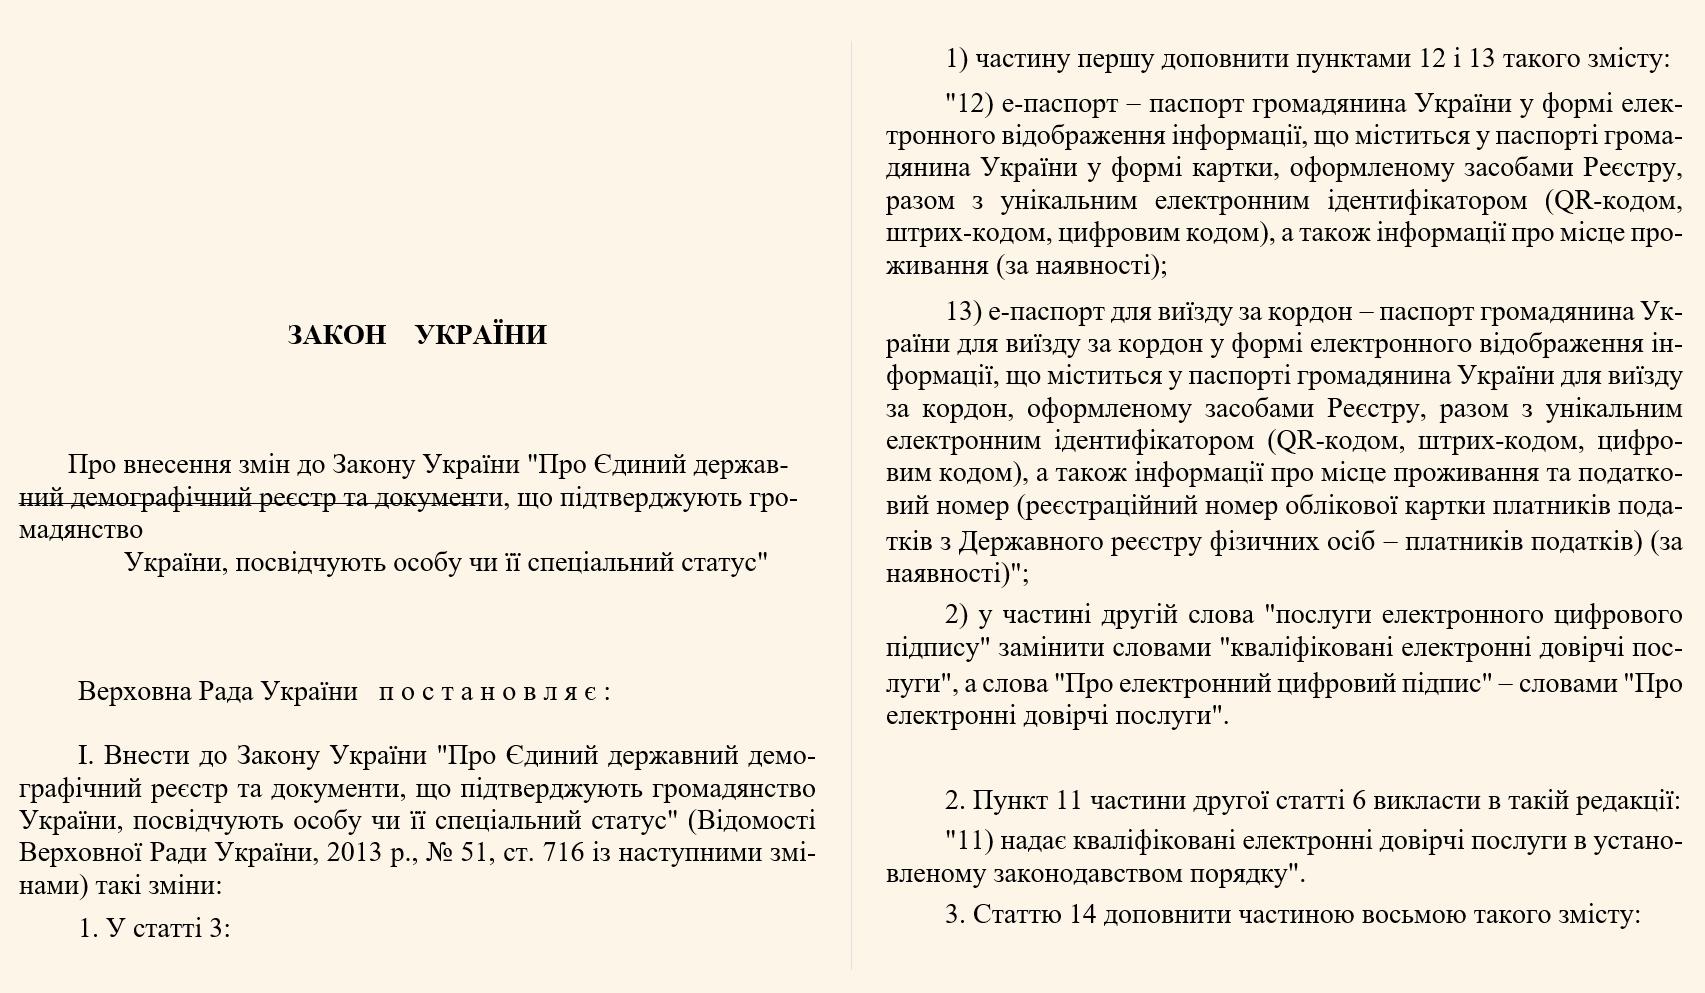 Верховная Рада приняла закон: Украины смогут выезжать за границу без паспорта на руках